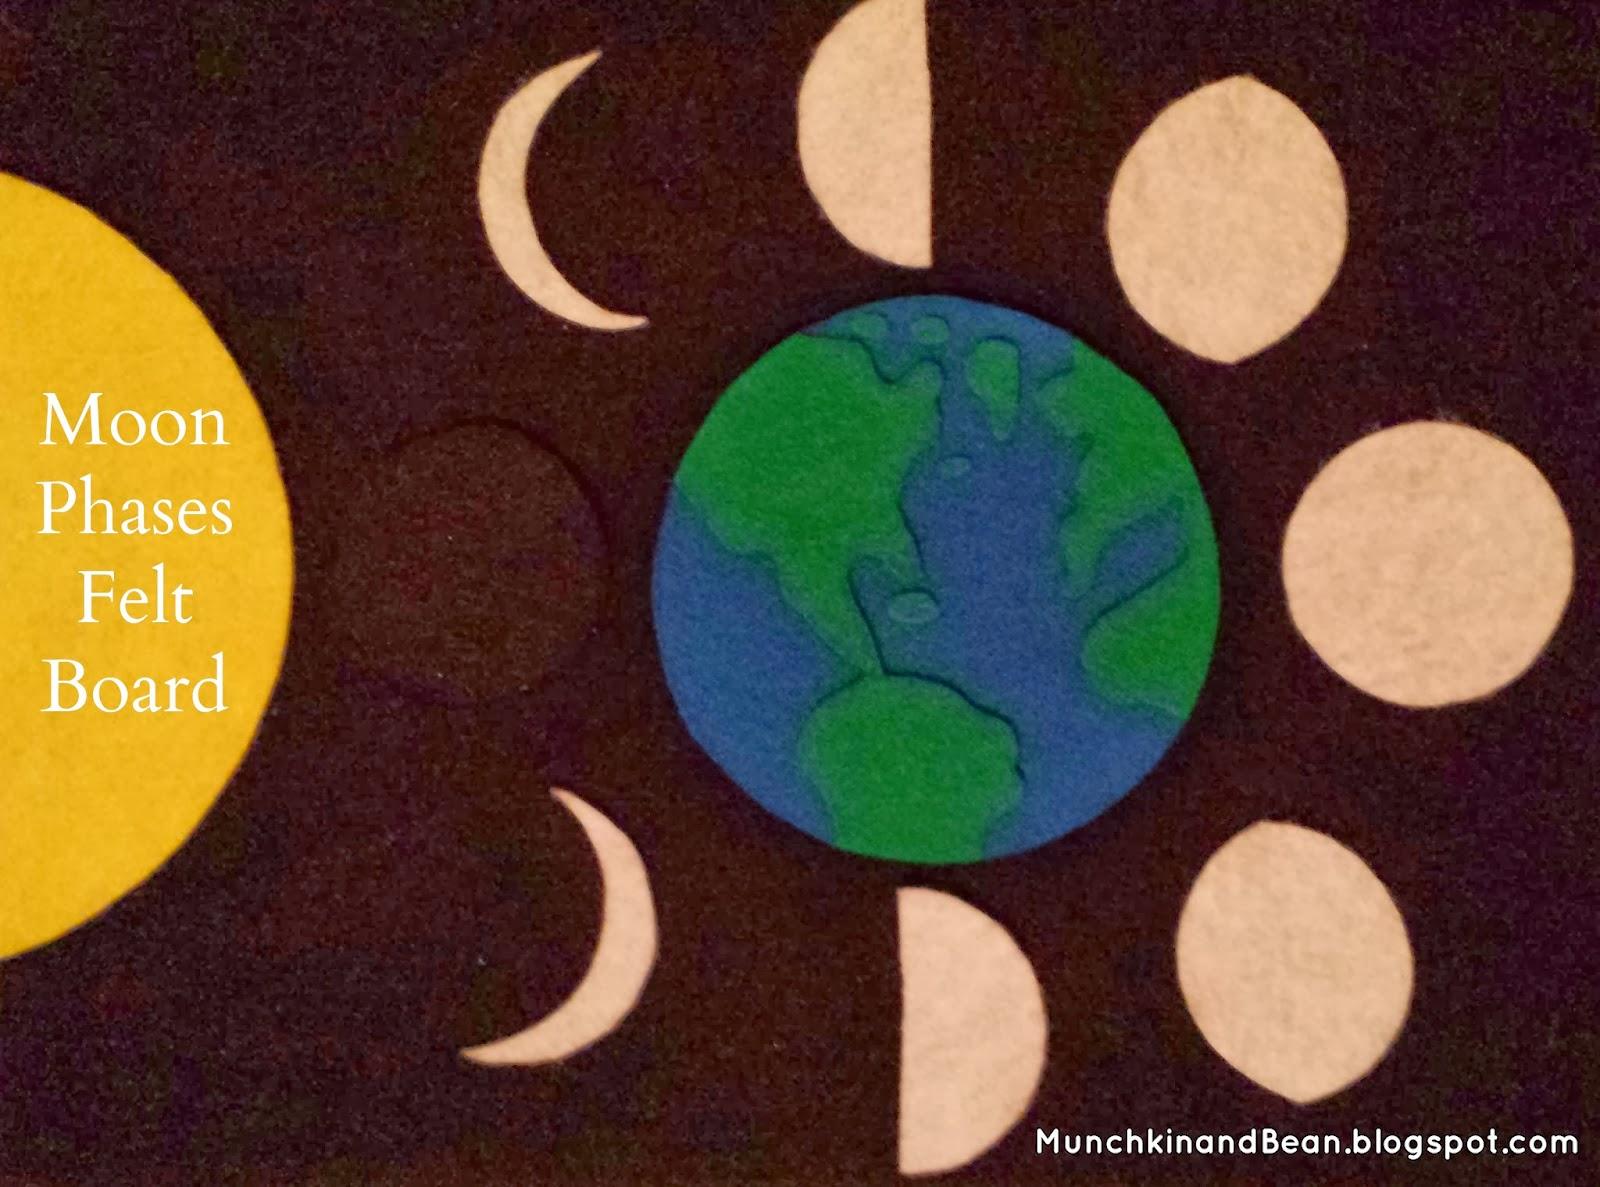 http://munchkinandbean.blogspot.com/2014/02/moon-phases-felt-board.html